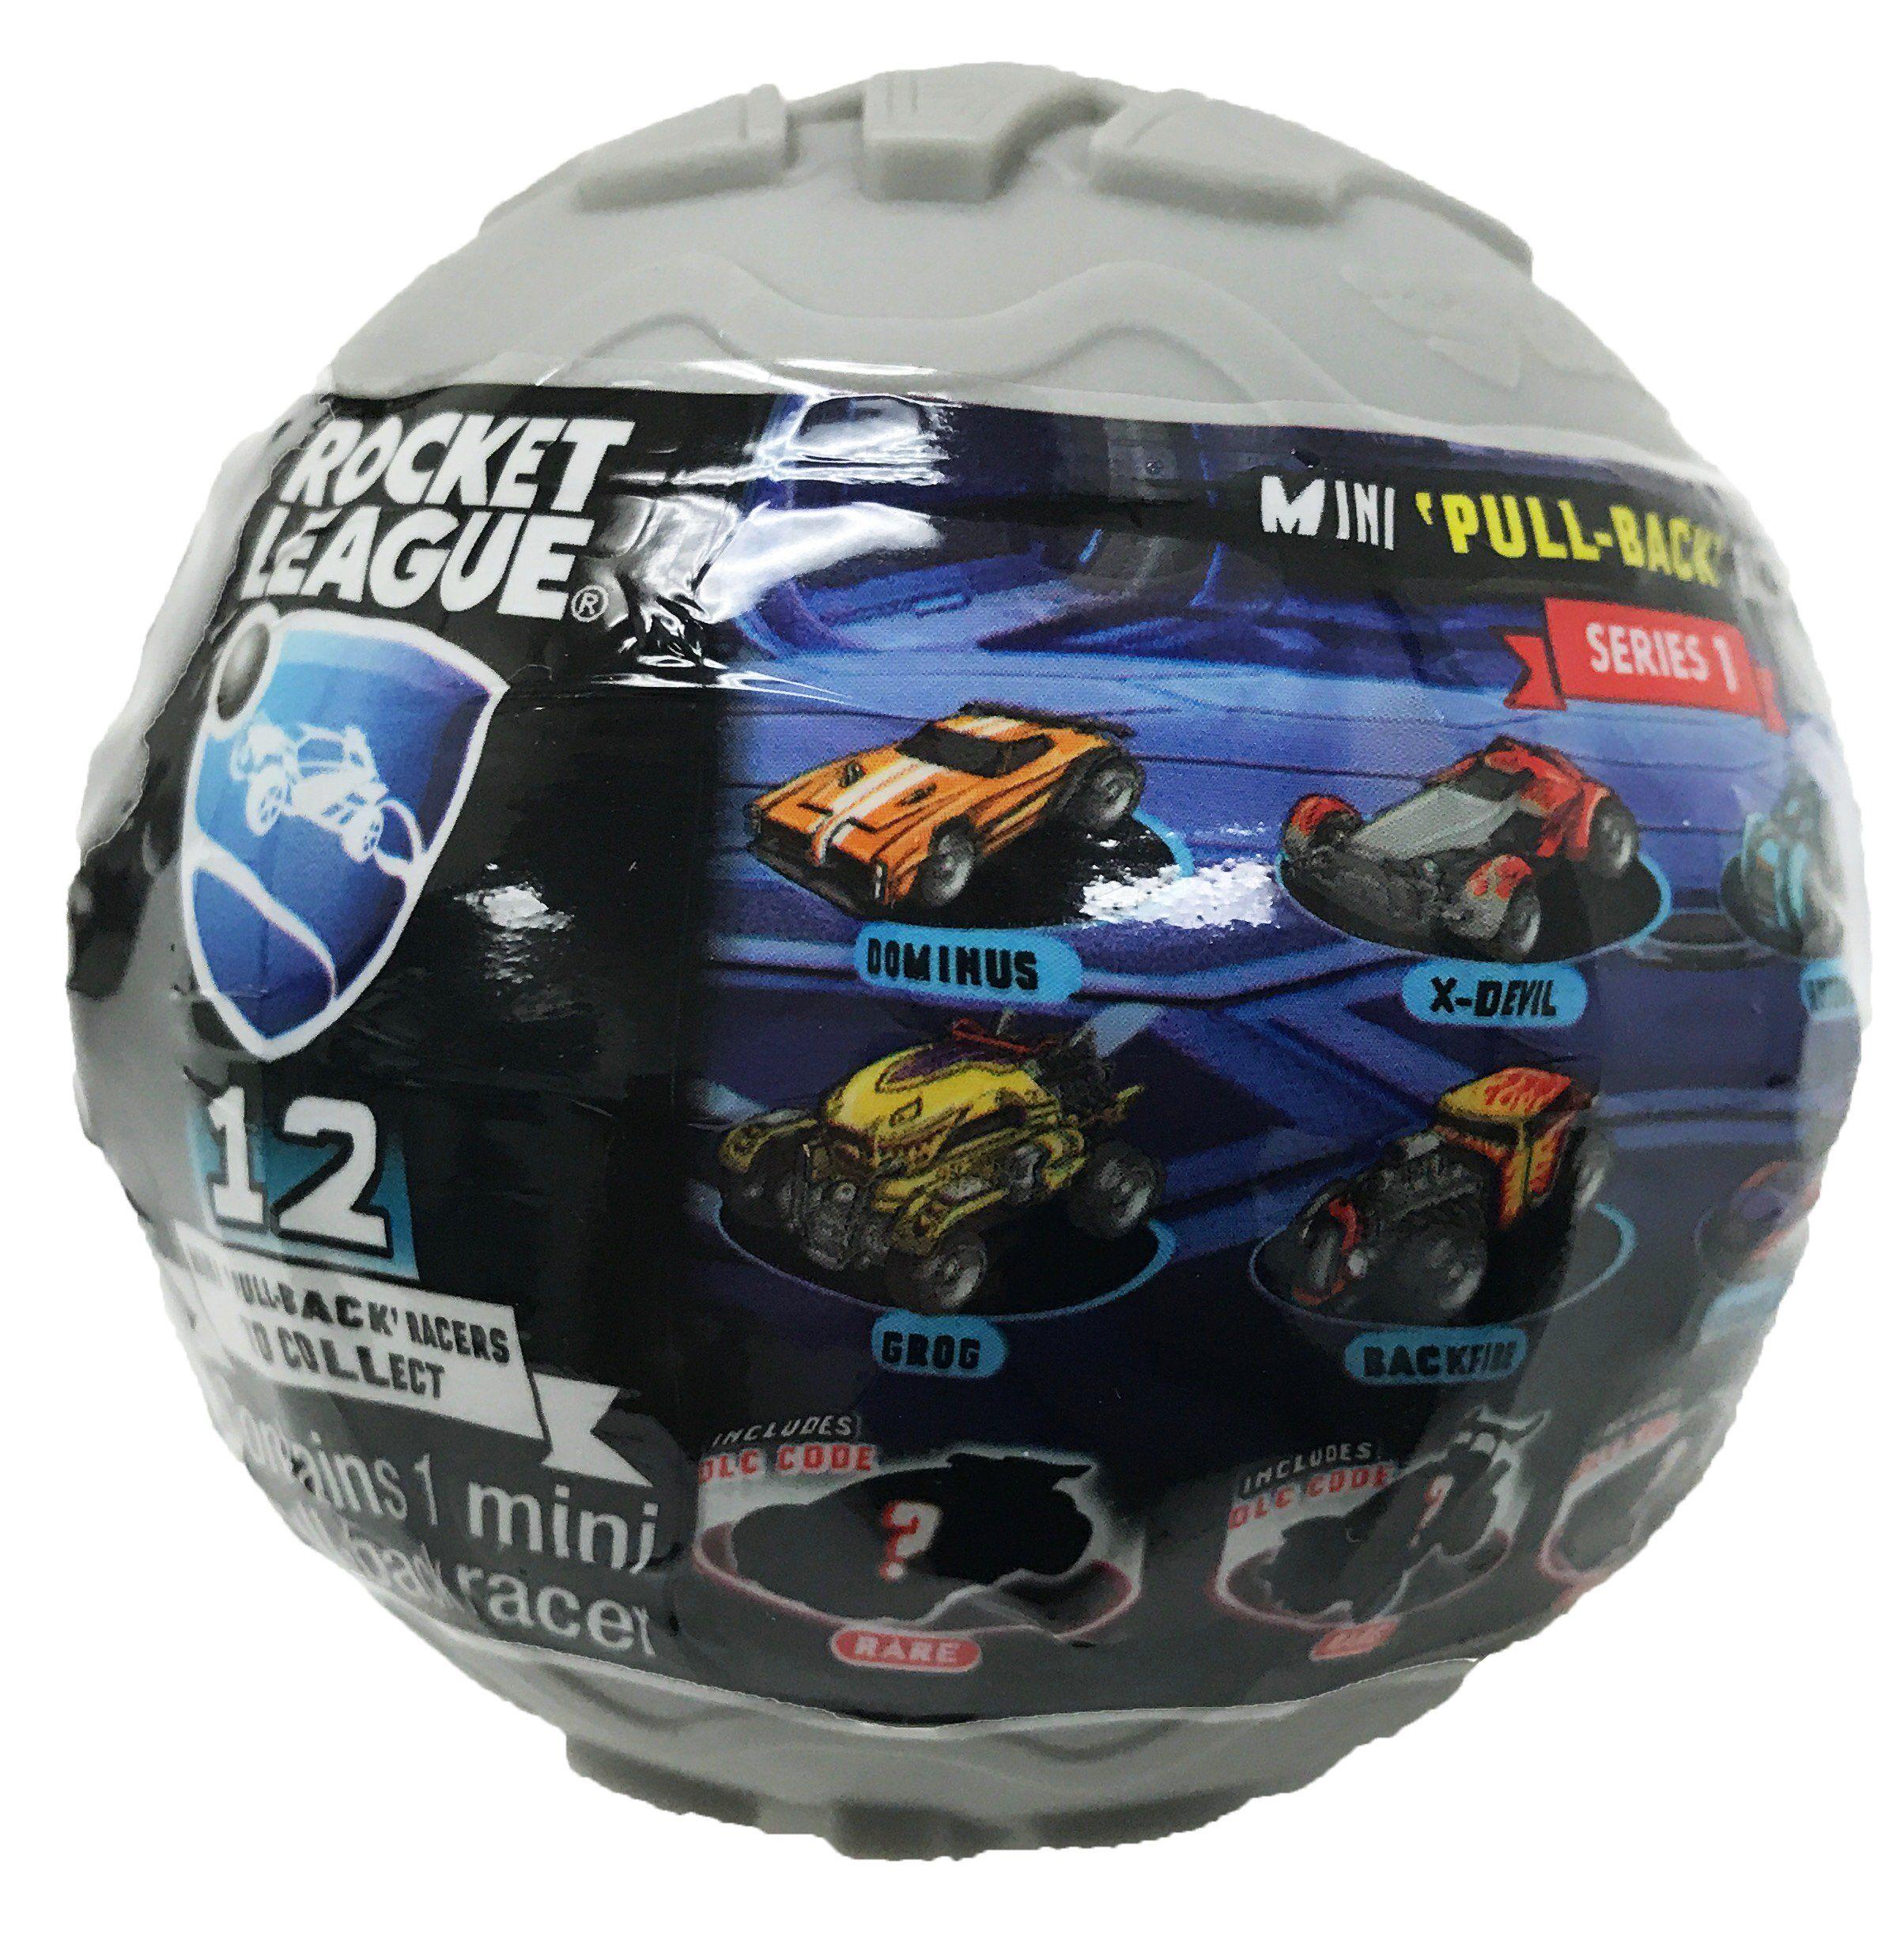 Rocket League Mini PullBack Racer Car Mystery Ball 1Pack